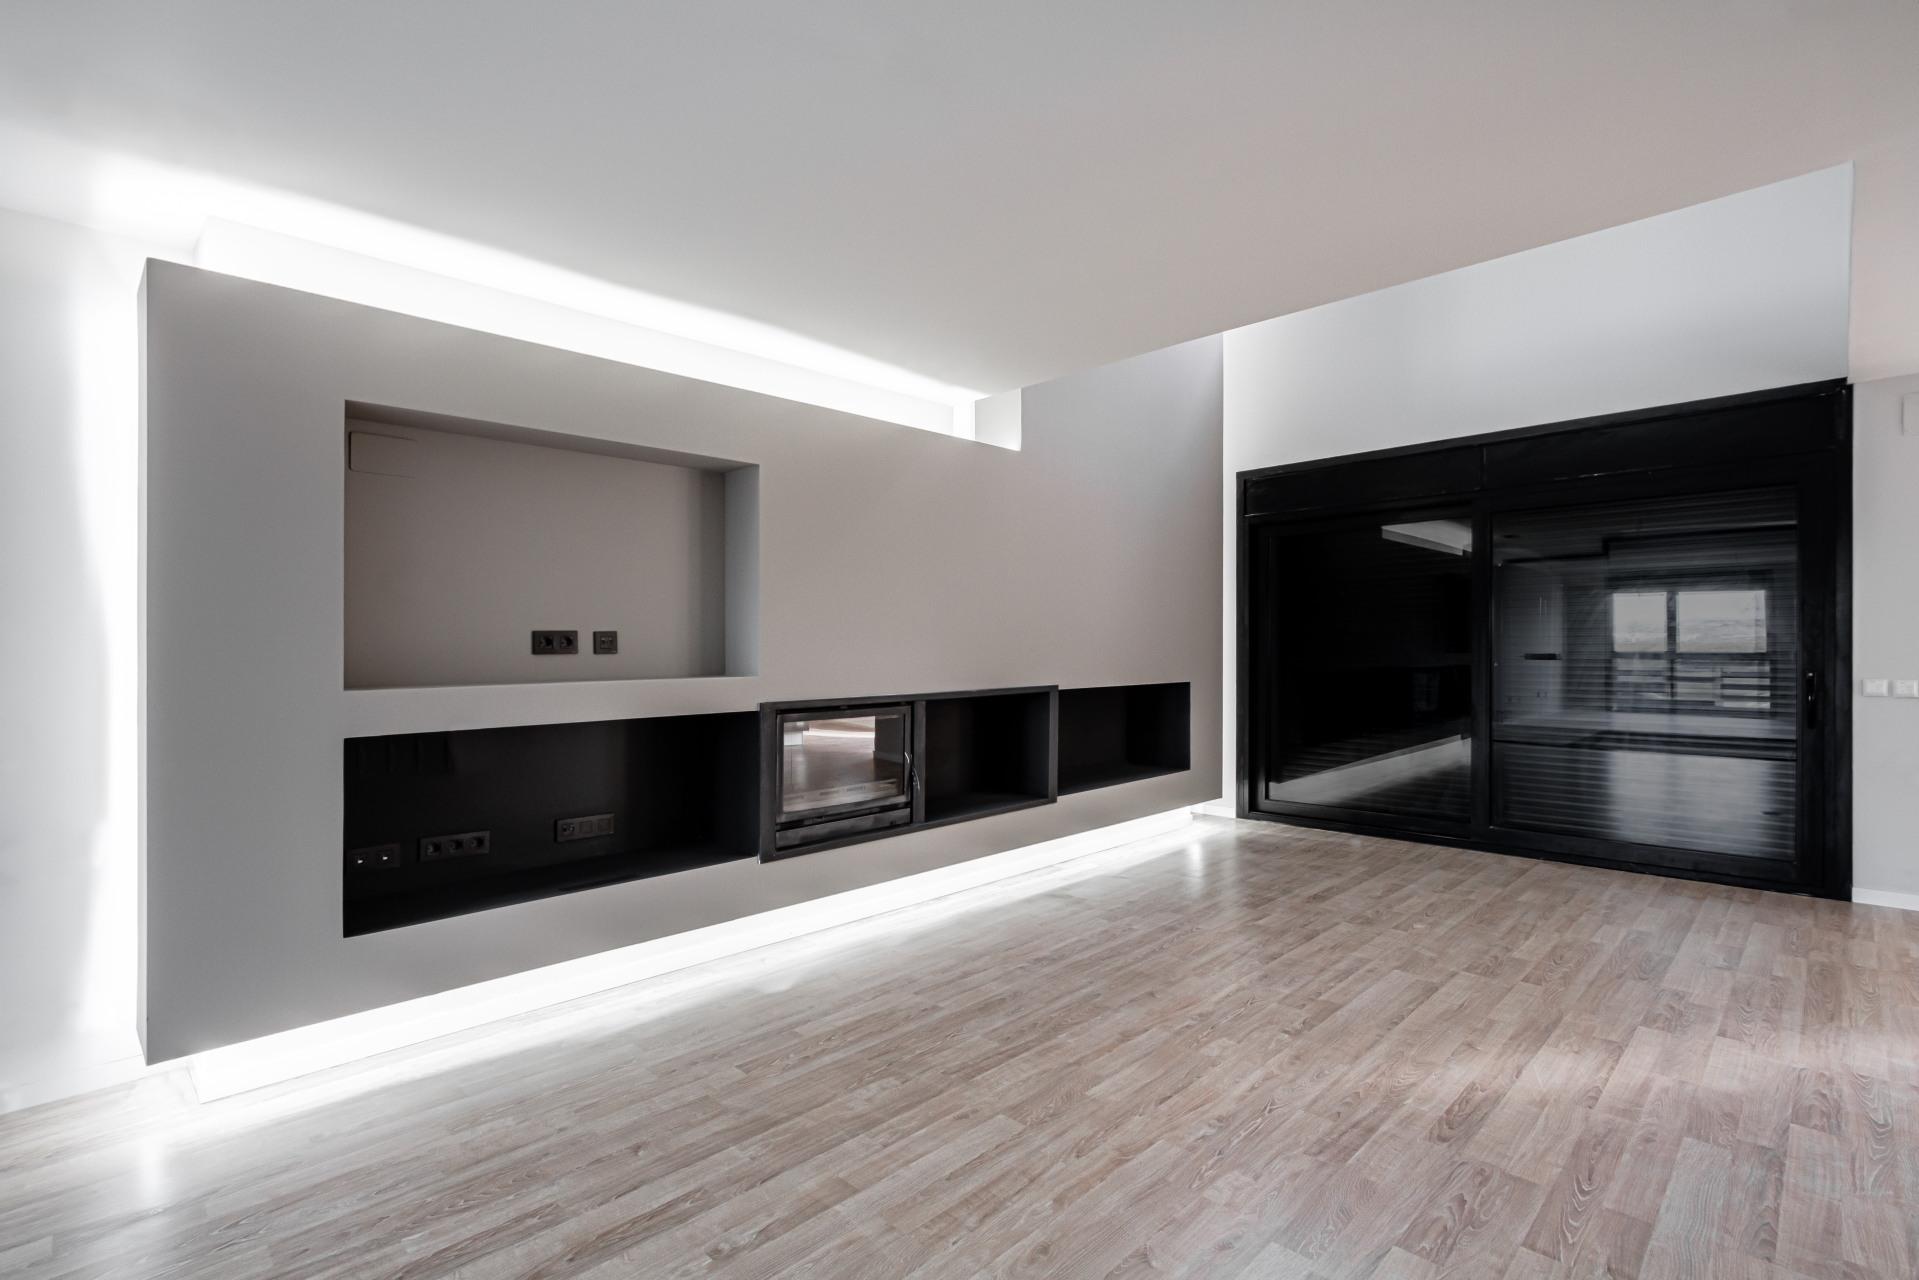 fotografia-arquitectura-valencia-german-cabo-viraje-v01 (12)